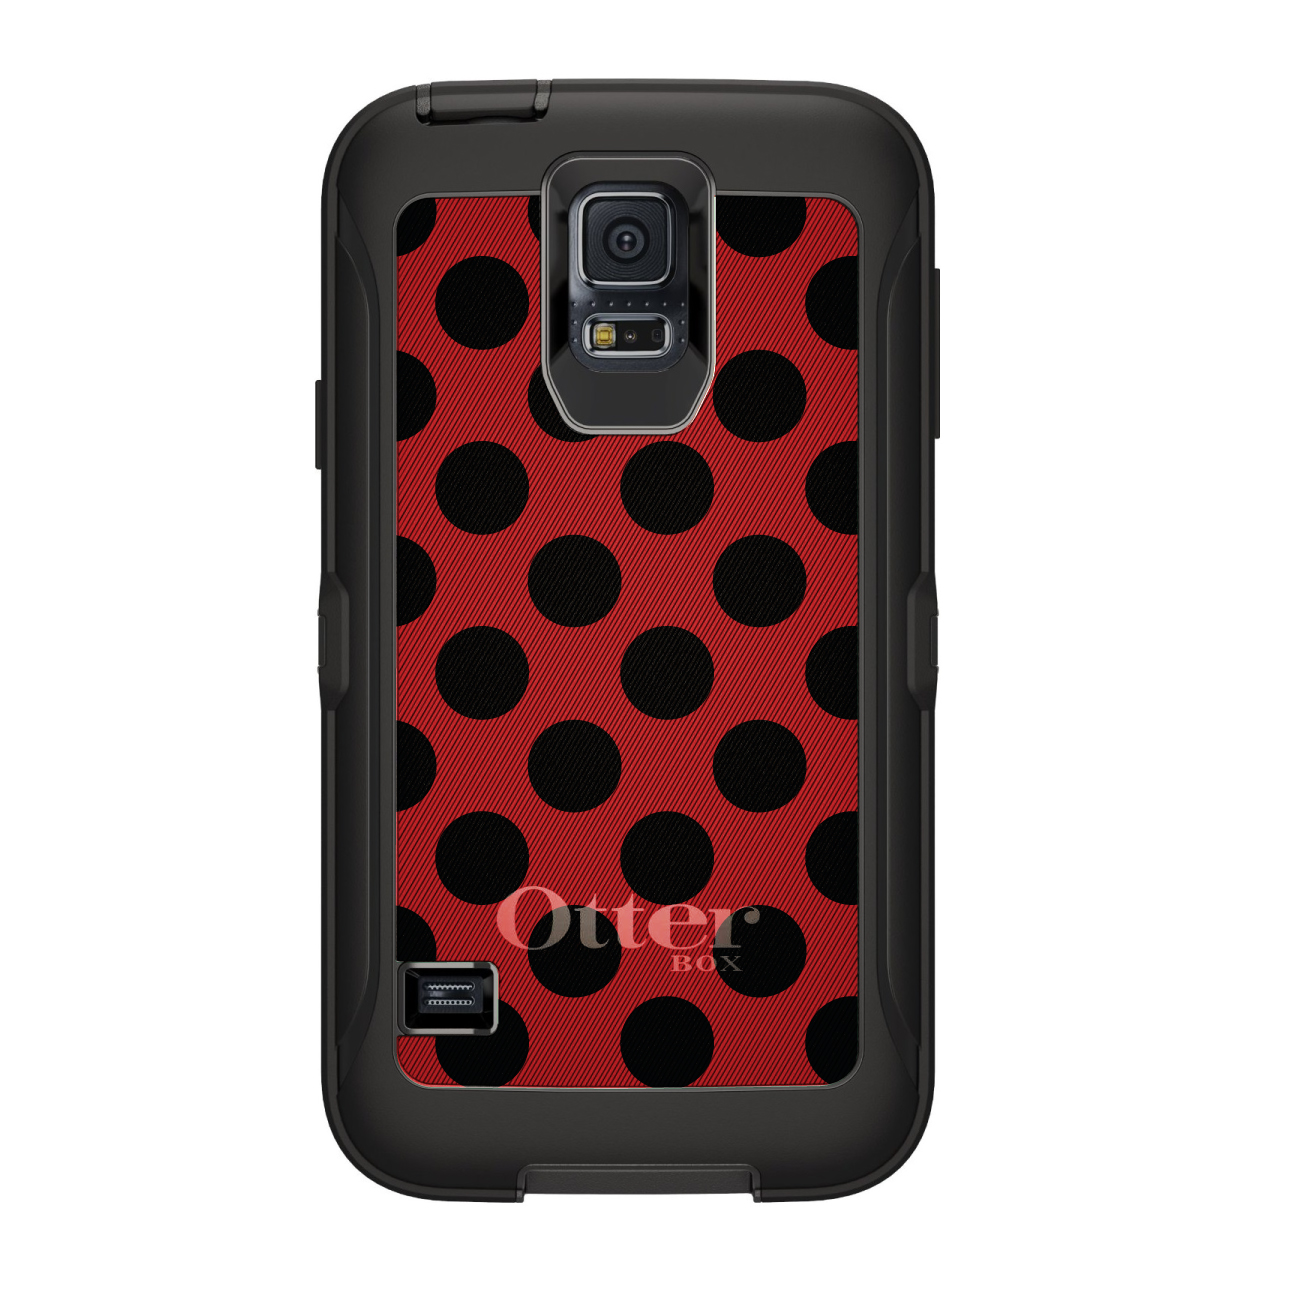 DistinctInk™ Custom Black OtterBox Defender Series Case for Samsung Galaxy S5 - Black & Red Polka Dots